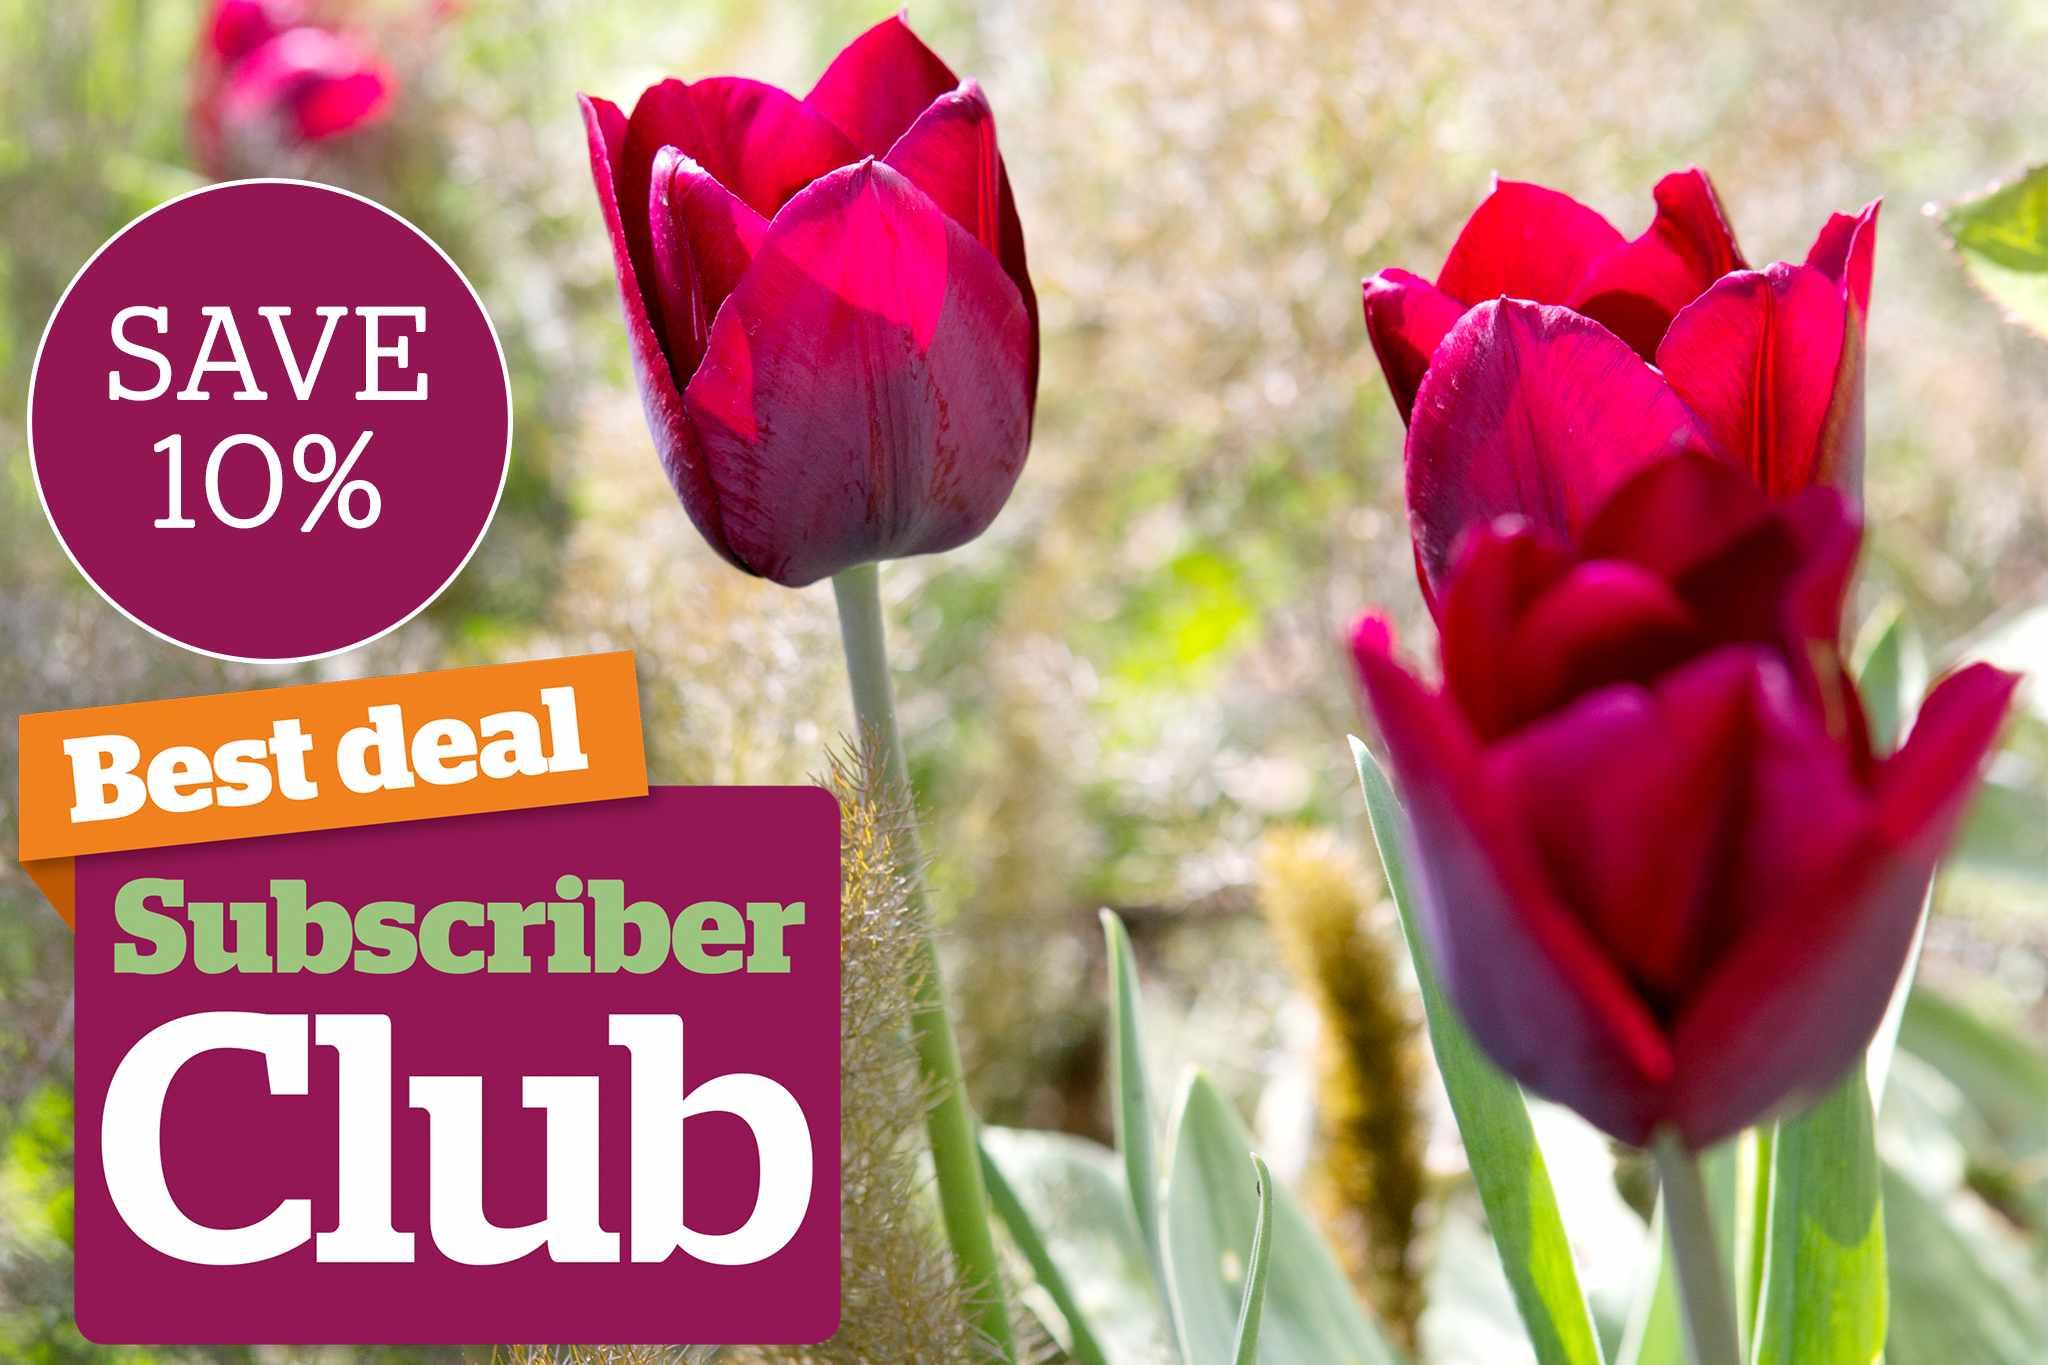 subs-club-10-per-cent-offer-card-V4-2048-1365